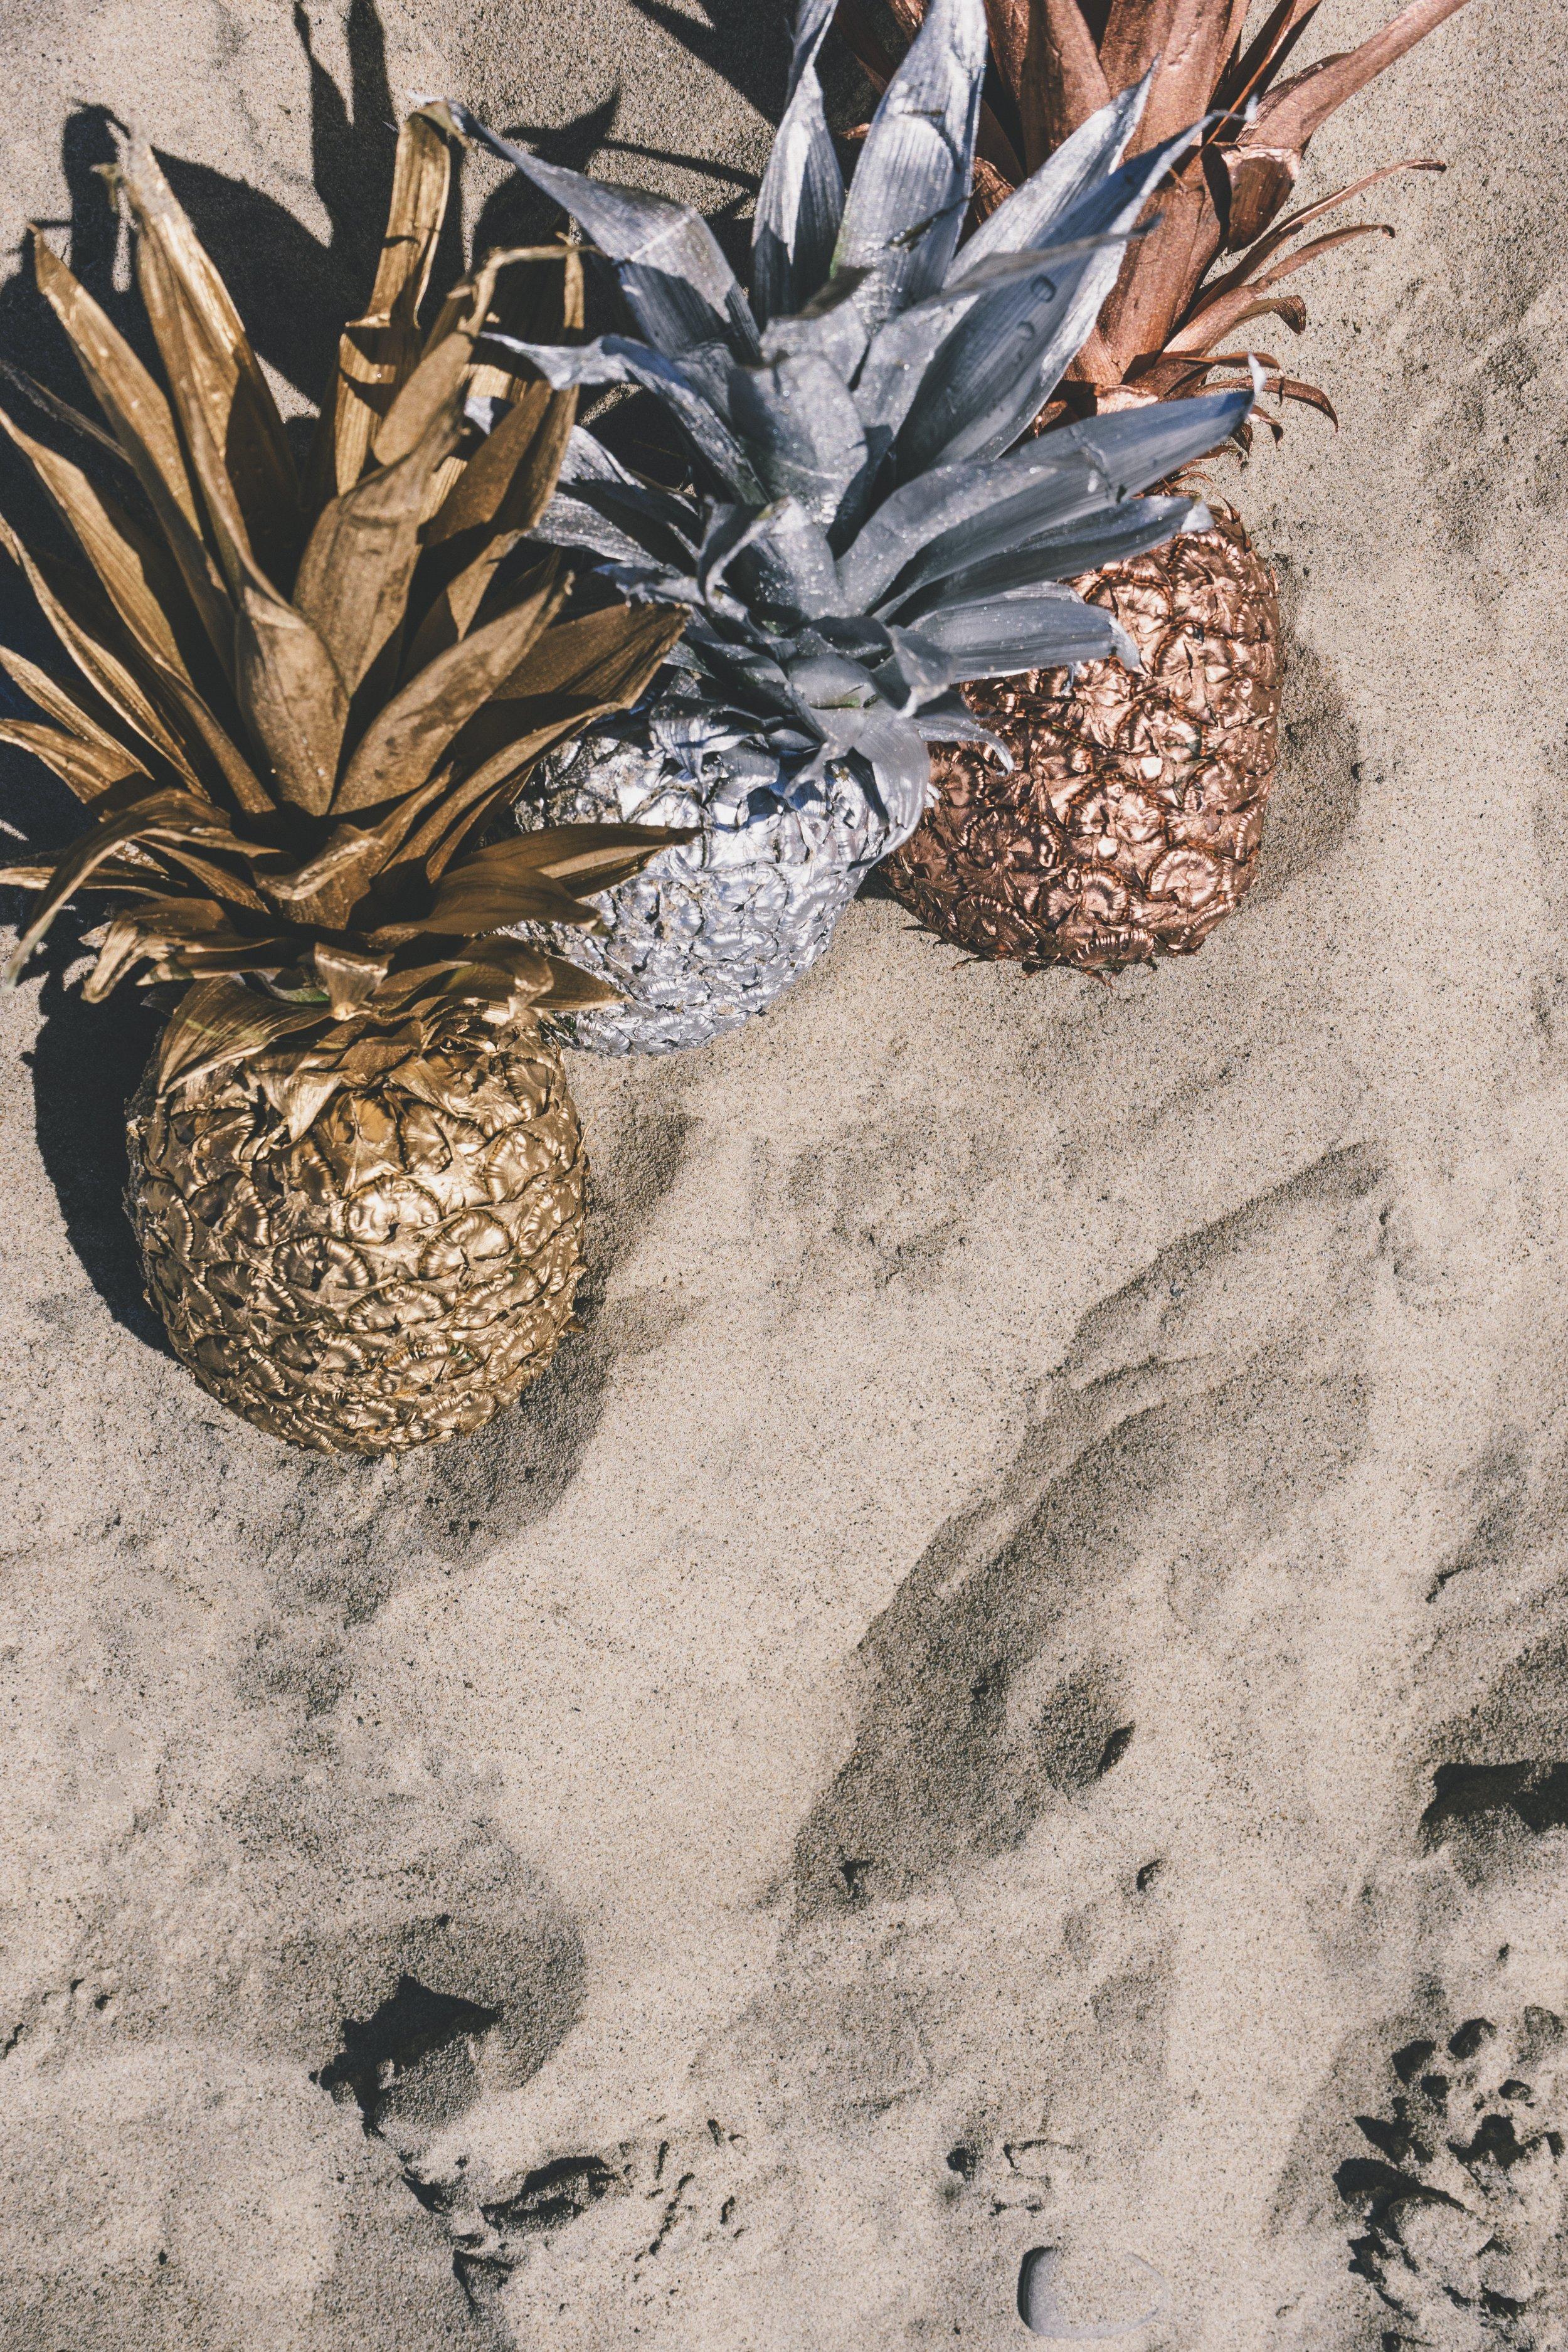 pineapple-supply-co-102693-unsplash.jpg